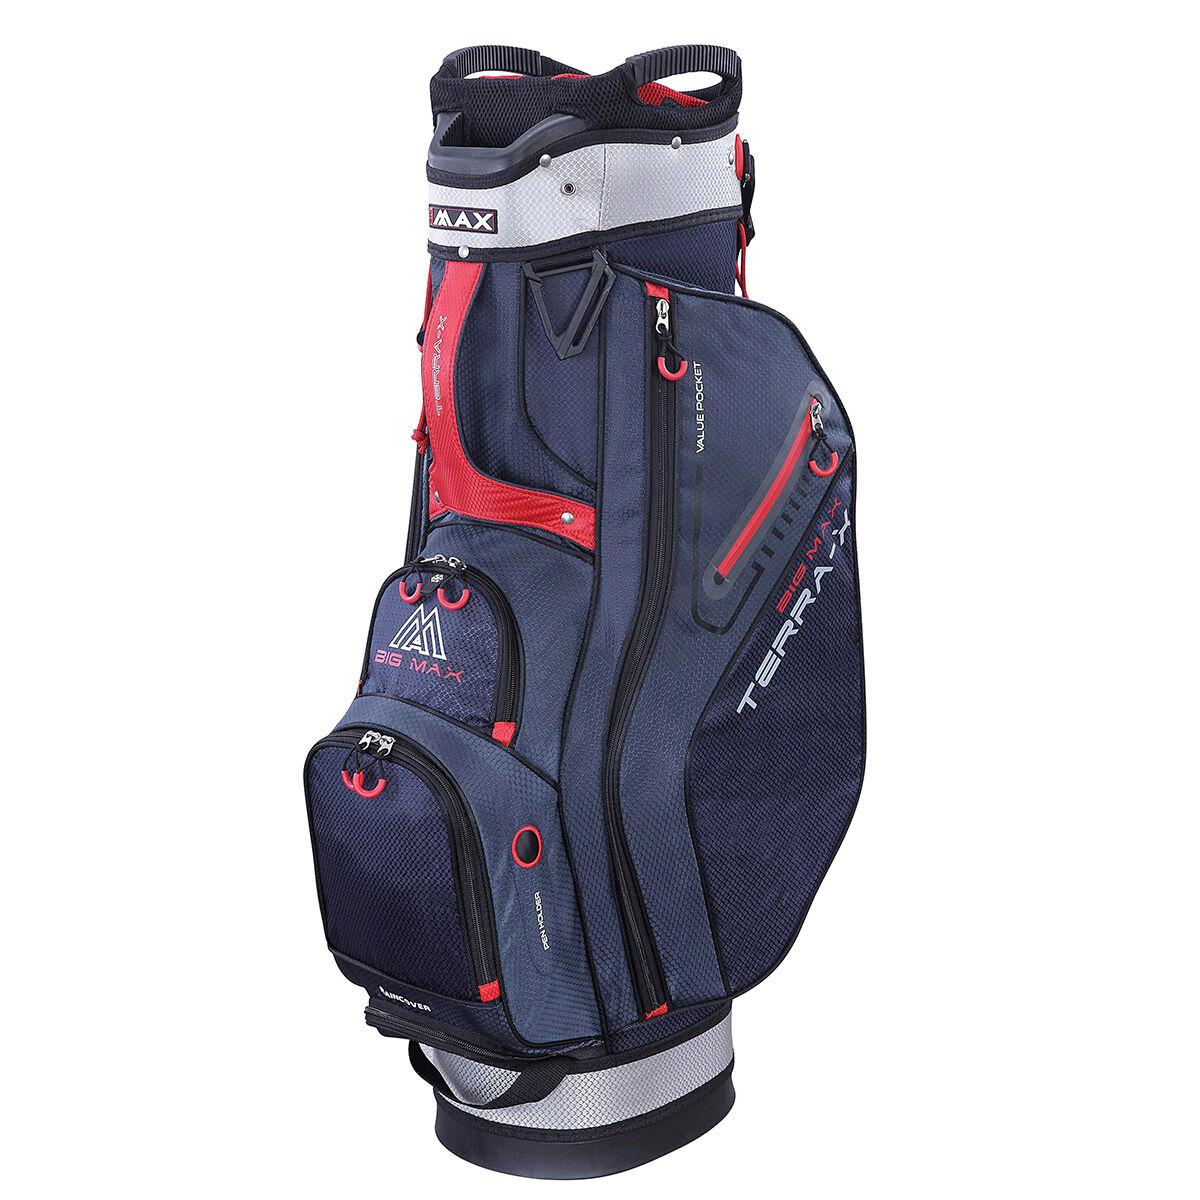 BIG MAX Terra X Golf Cart Bag, Navy/silver/red, One Size | American Golf